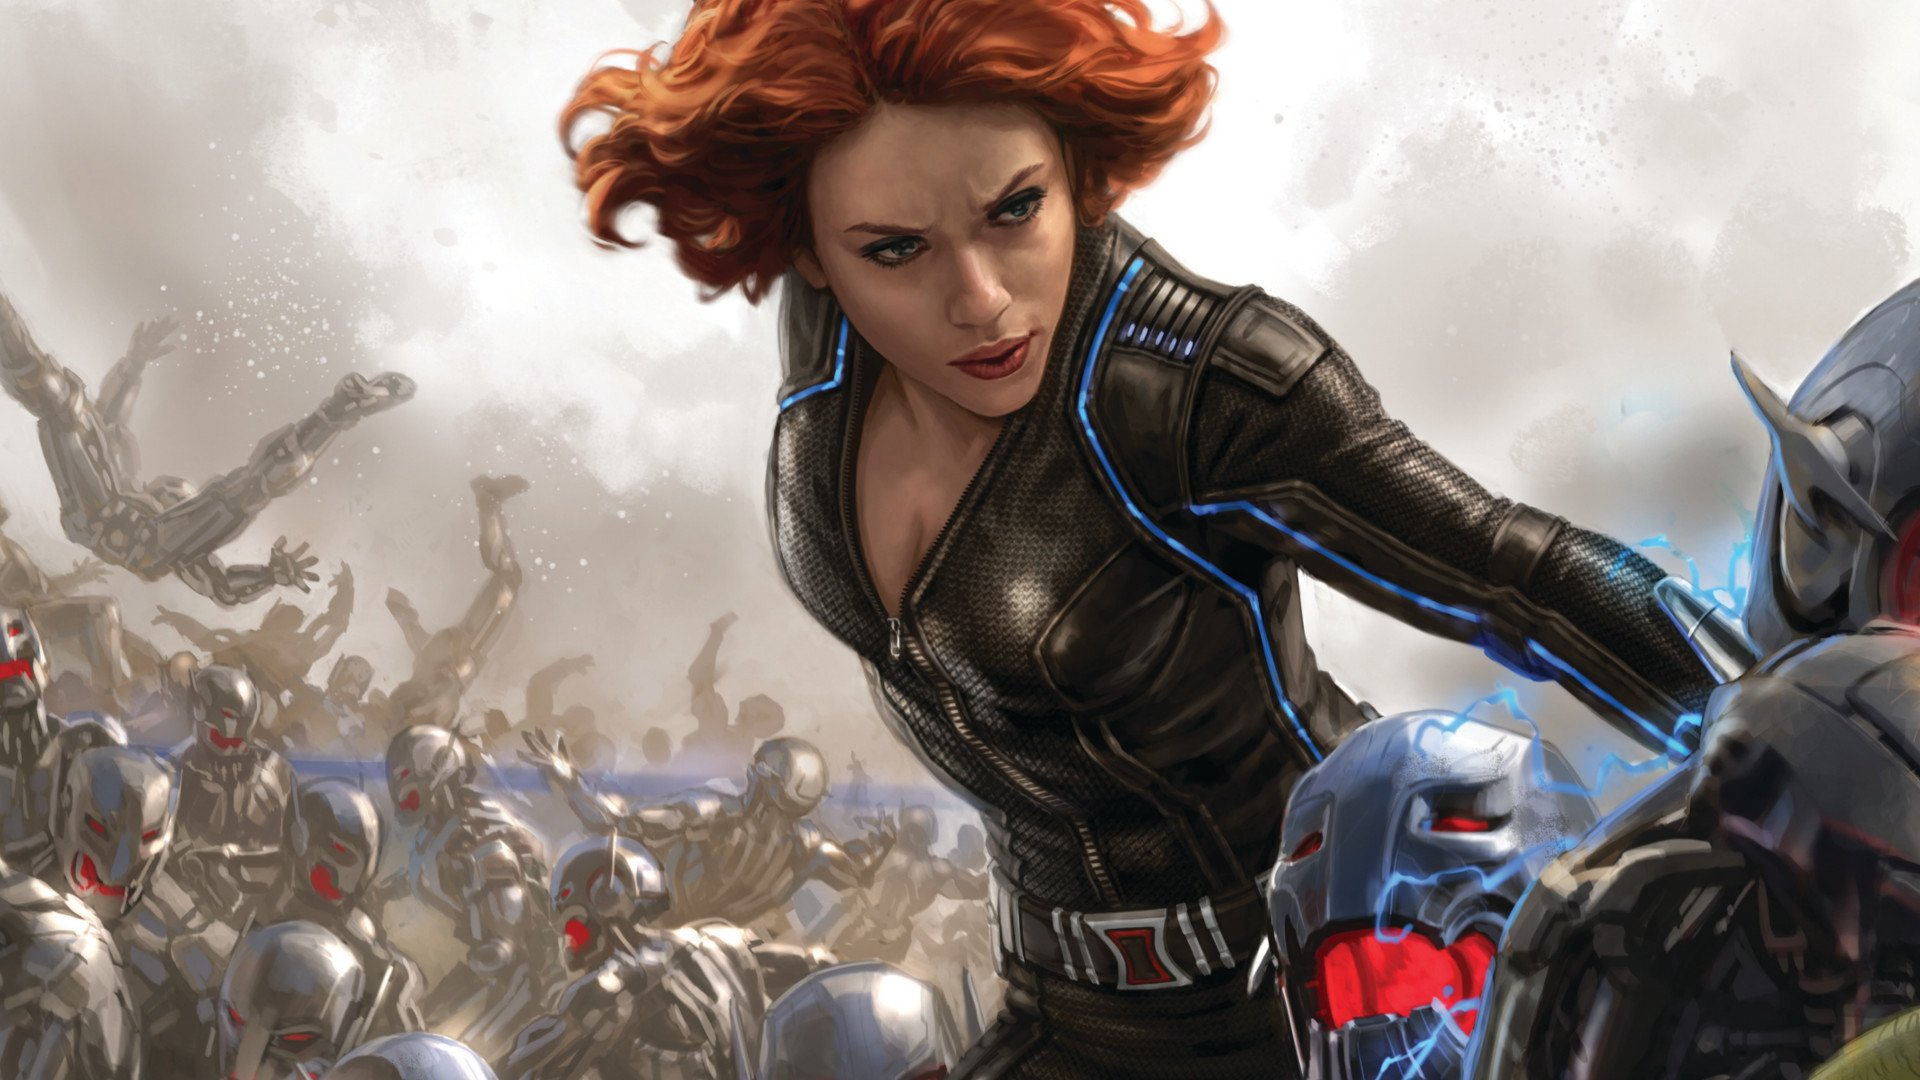 Movie - Avengers: Age of Ultron  Black Widow Natasha Romanoff Wallpaper